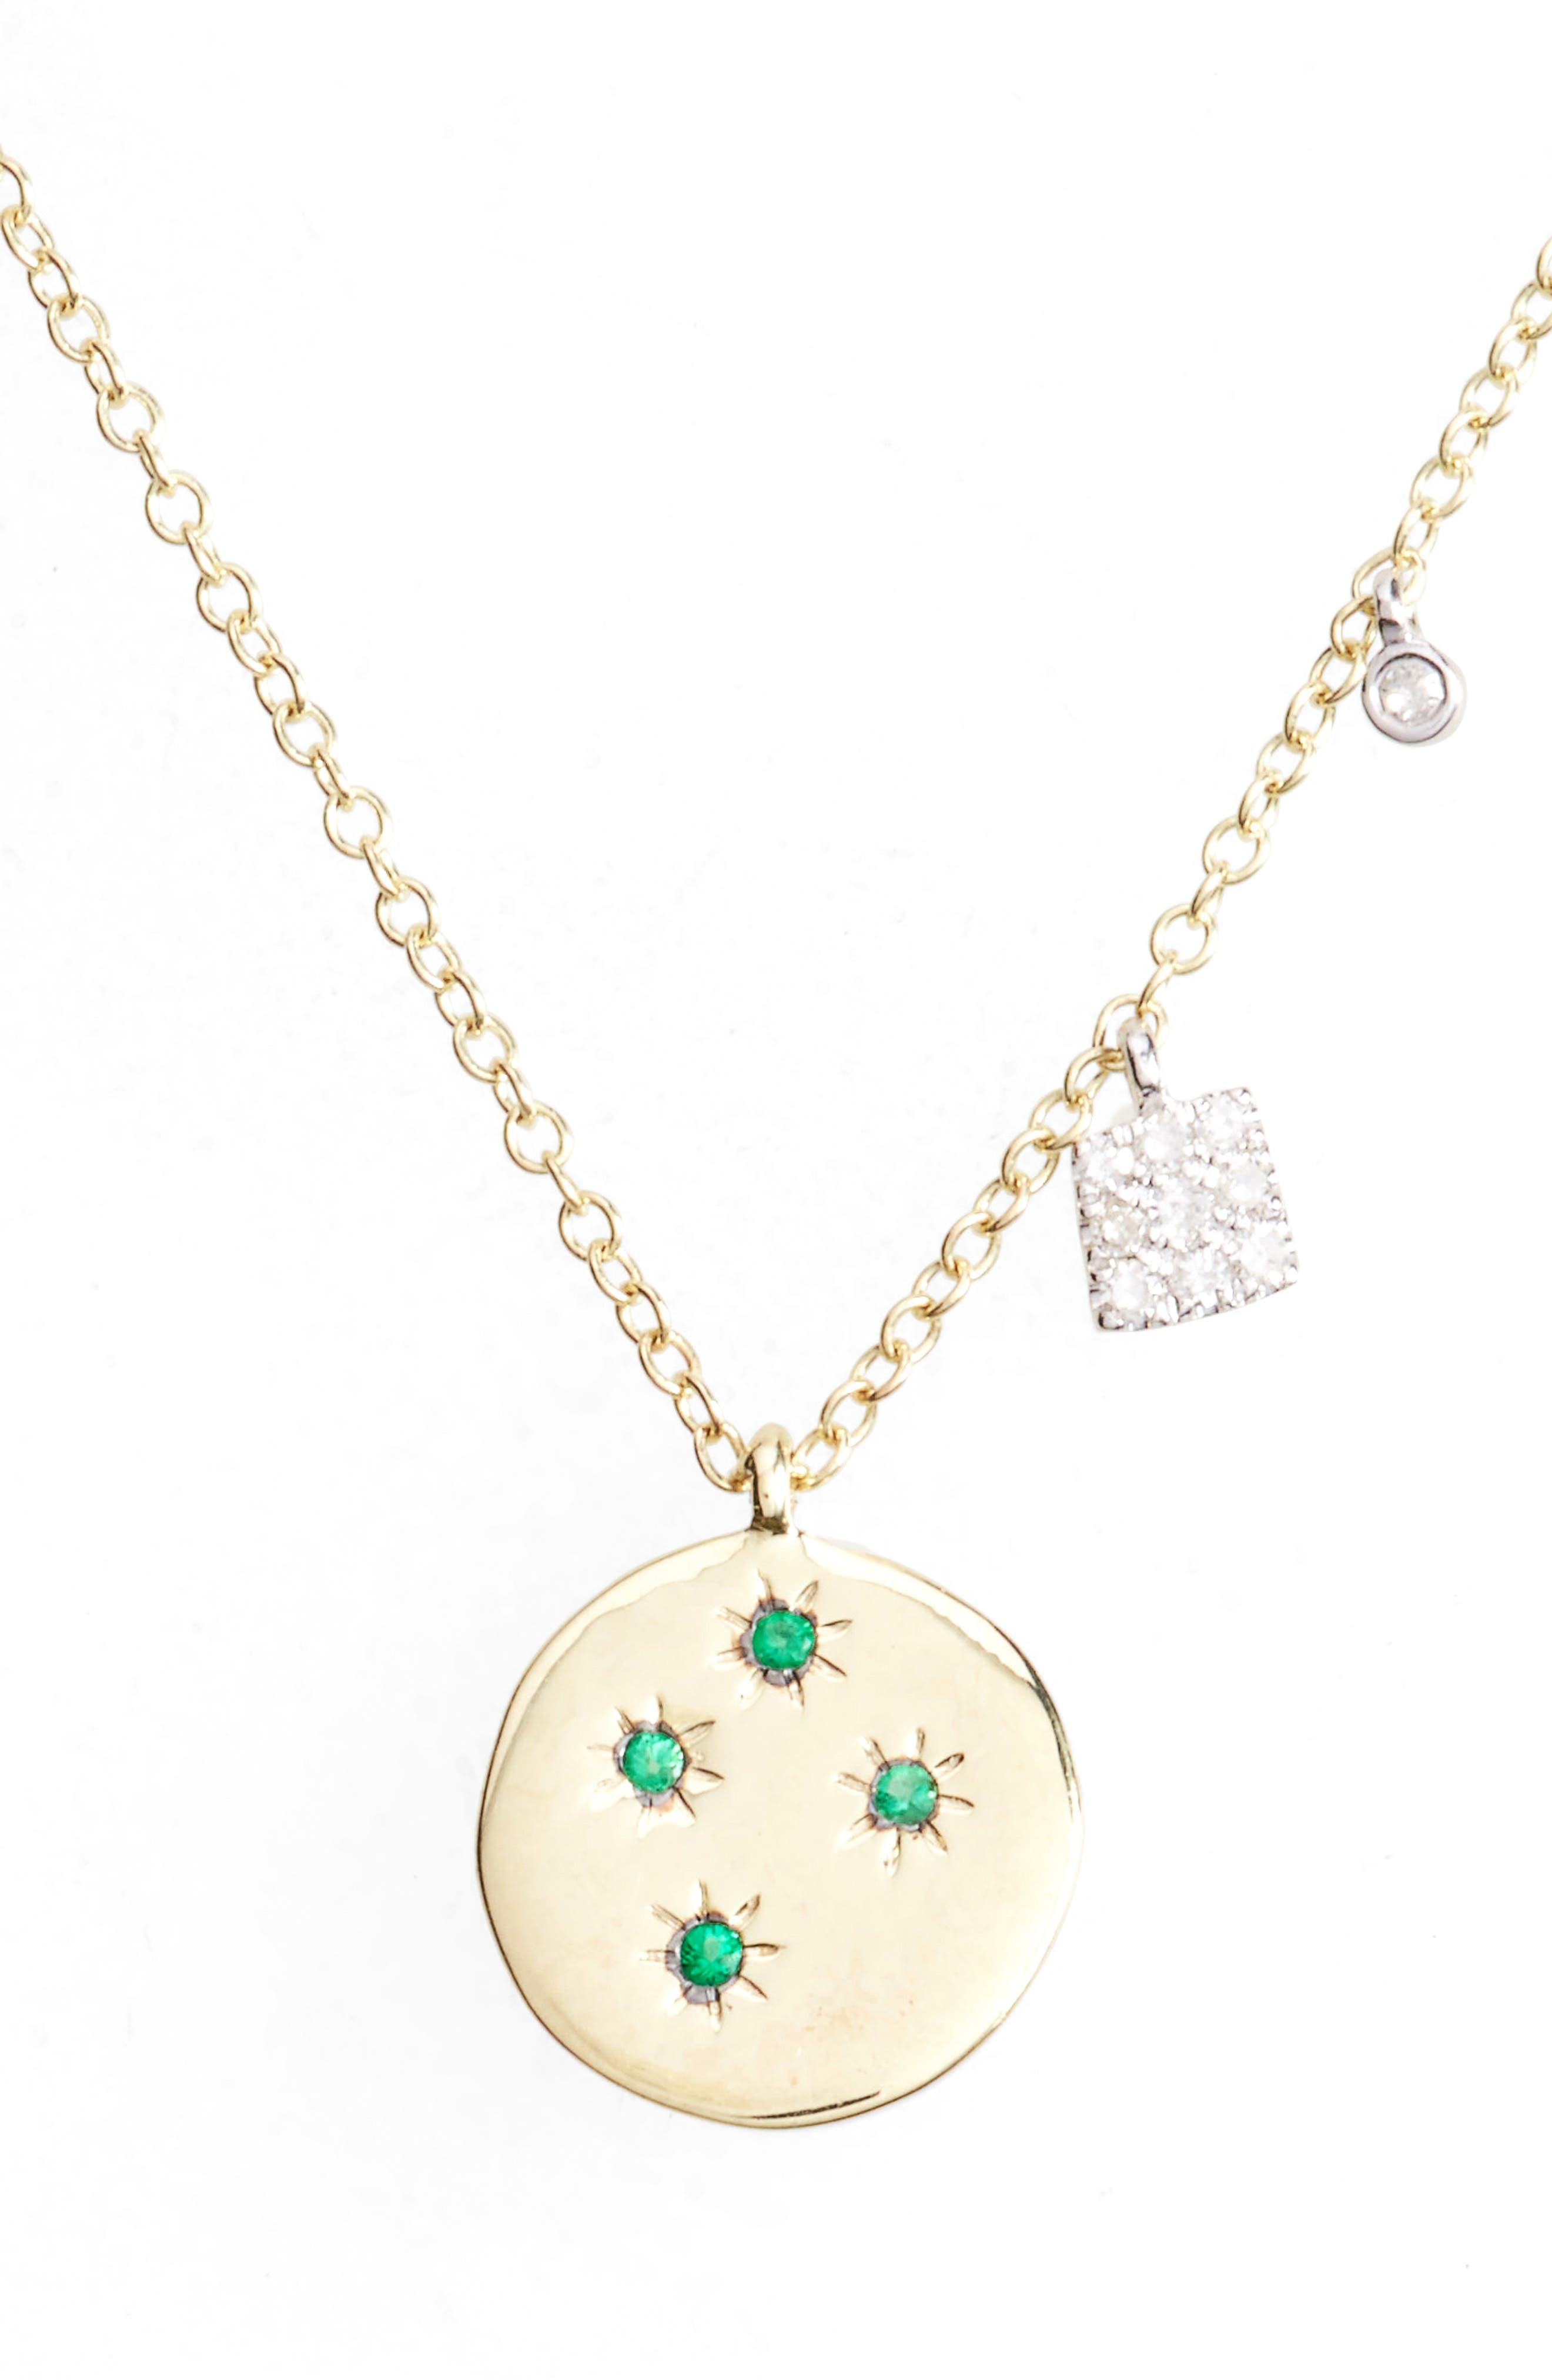 Diamond & Gemstone Pendant Necklace,                         Main,                         color, Yellow Gold/ Emerald